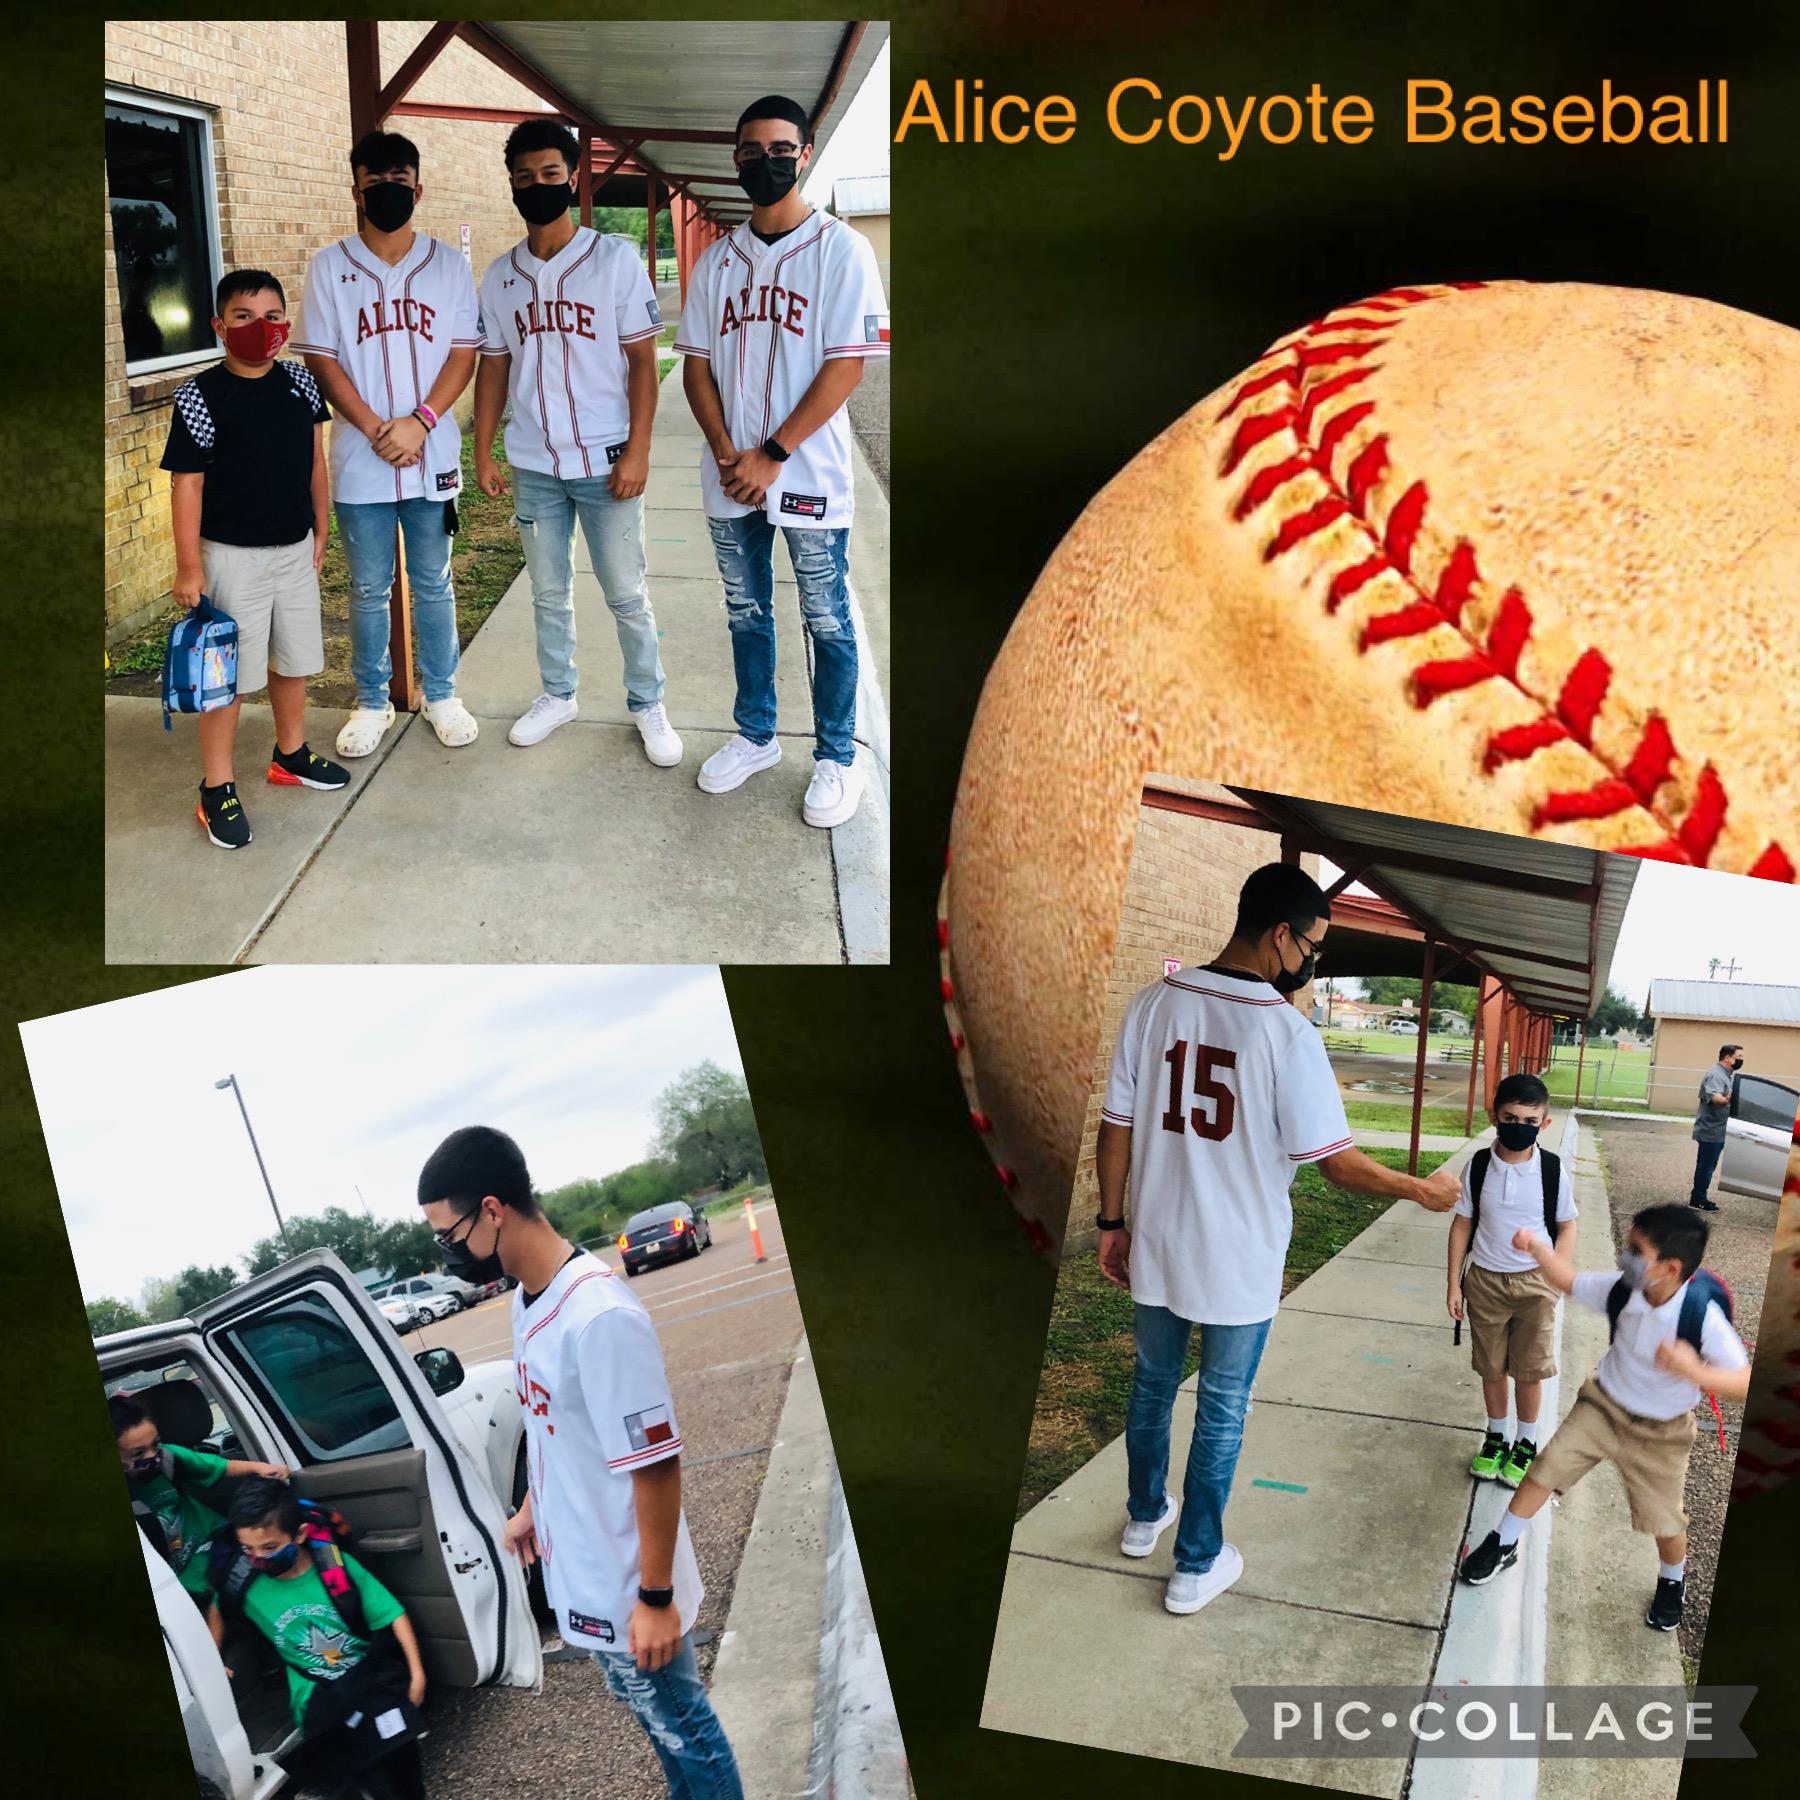 Coyote Baseball